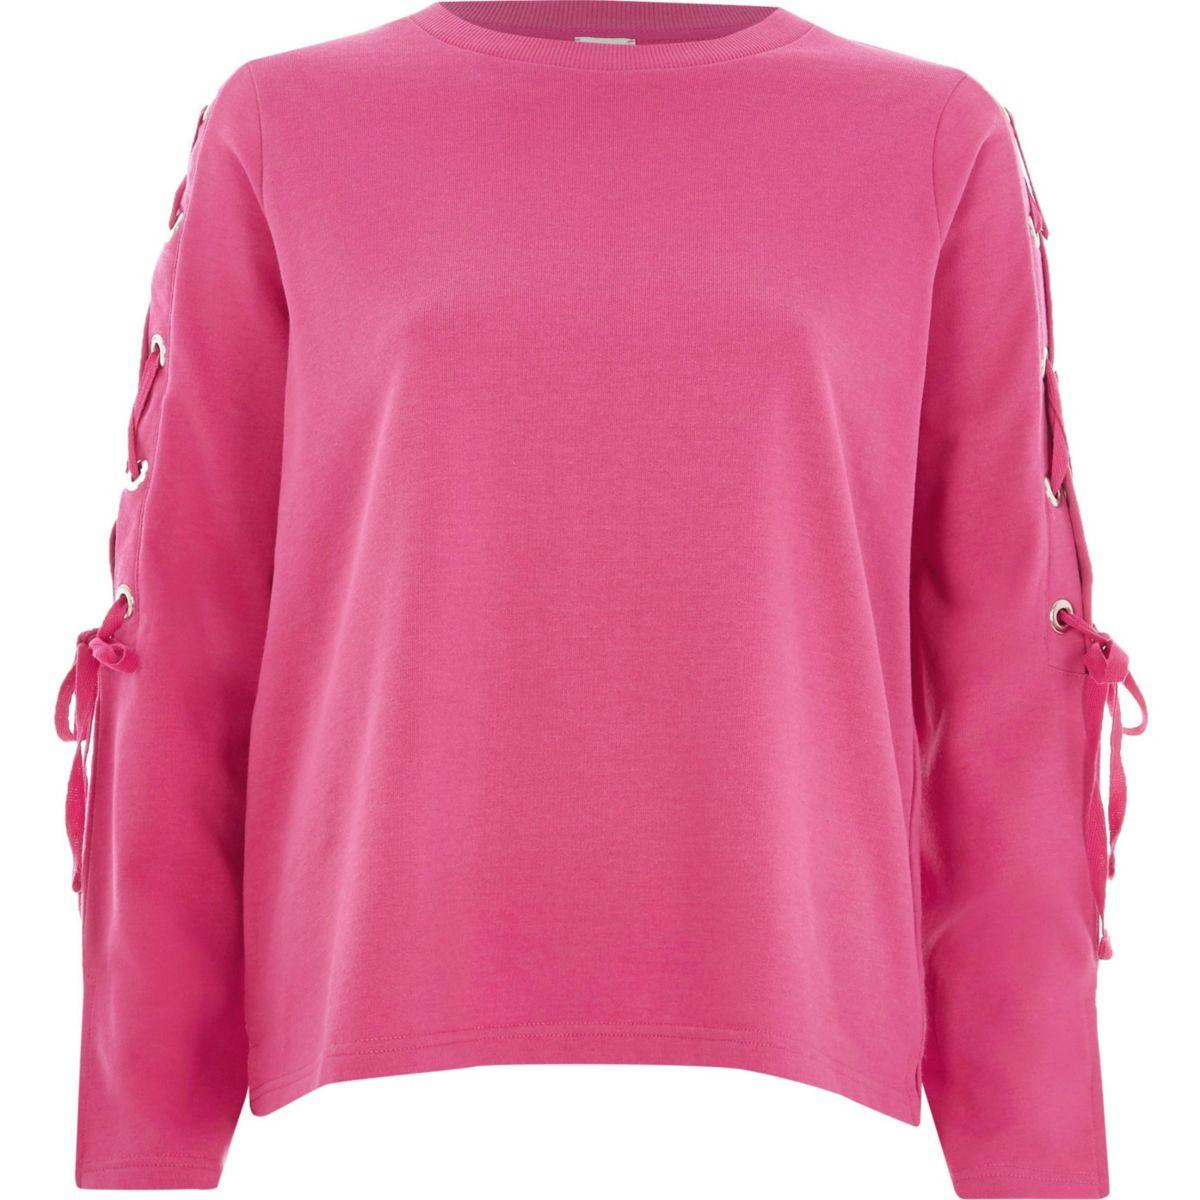 Pink lace-up sleeve sweatshirt